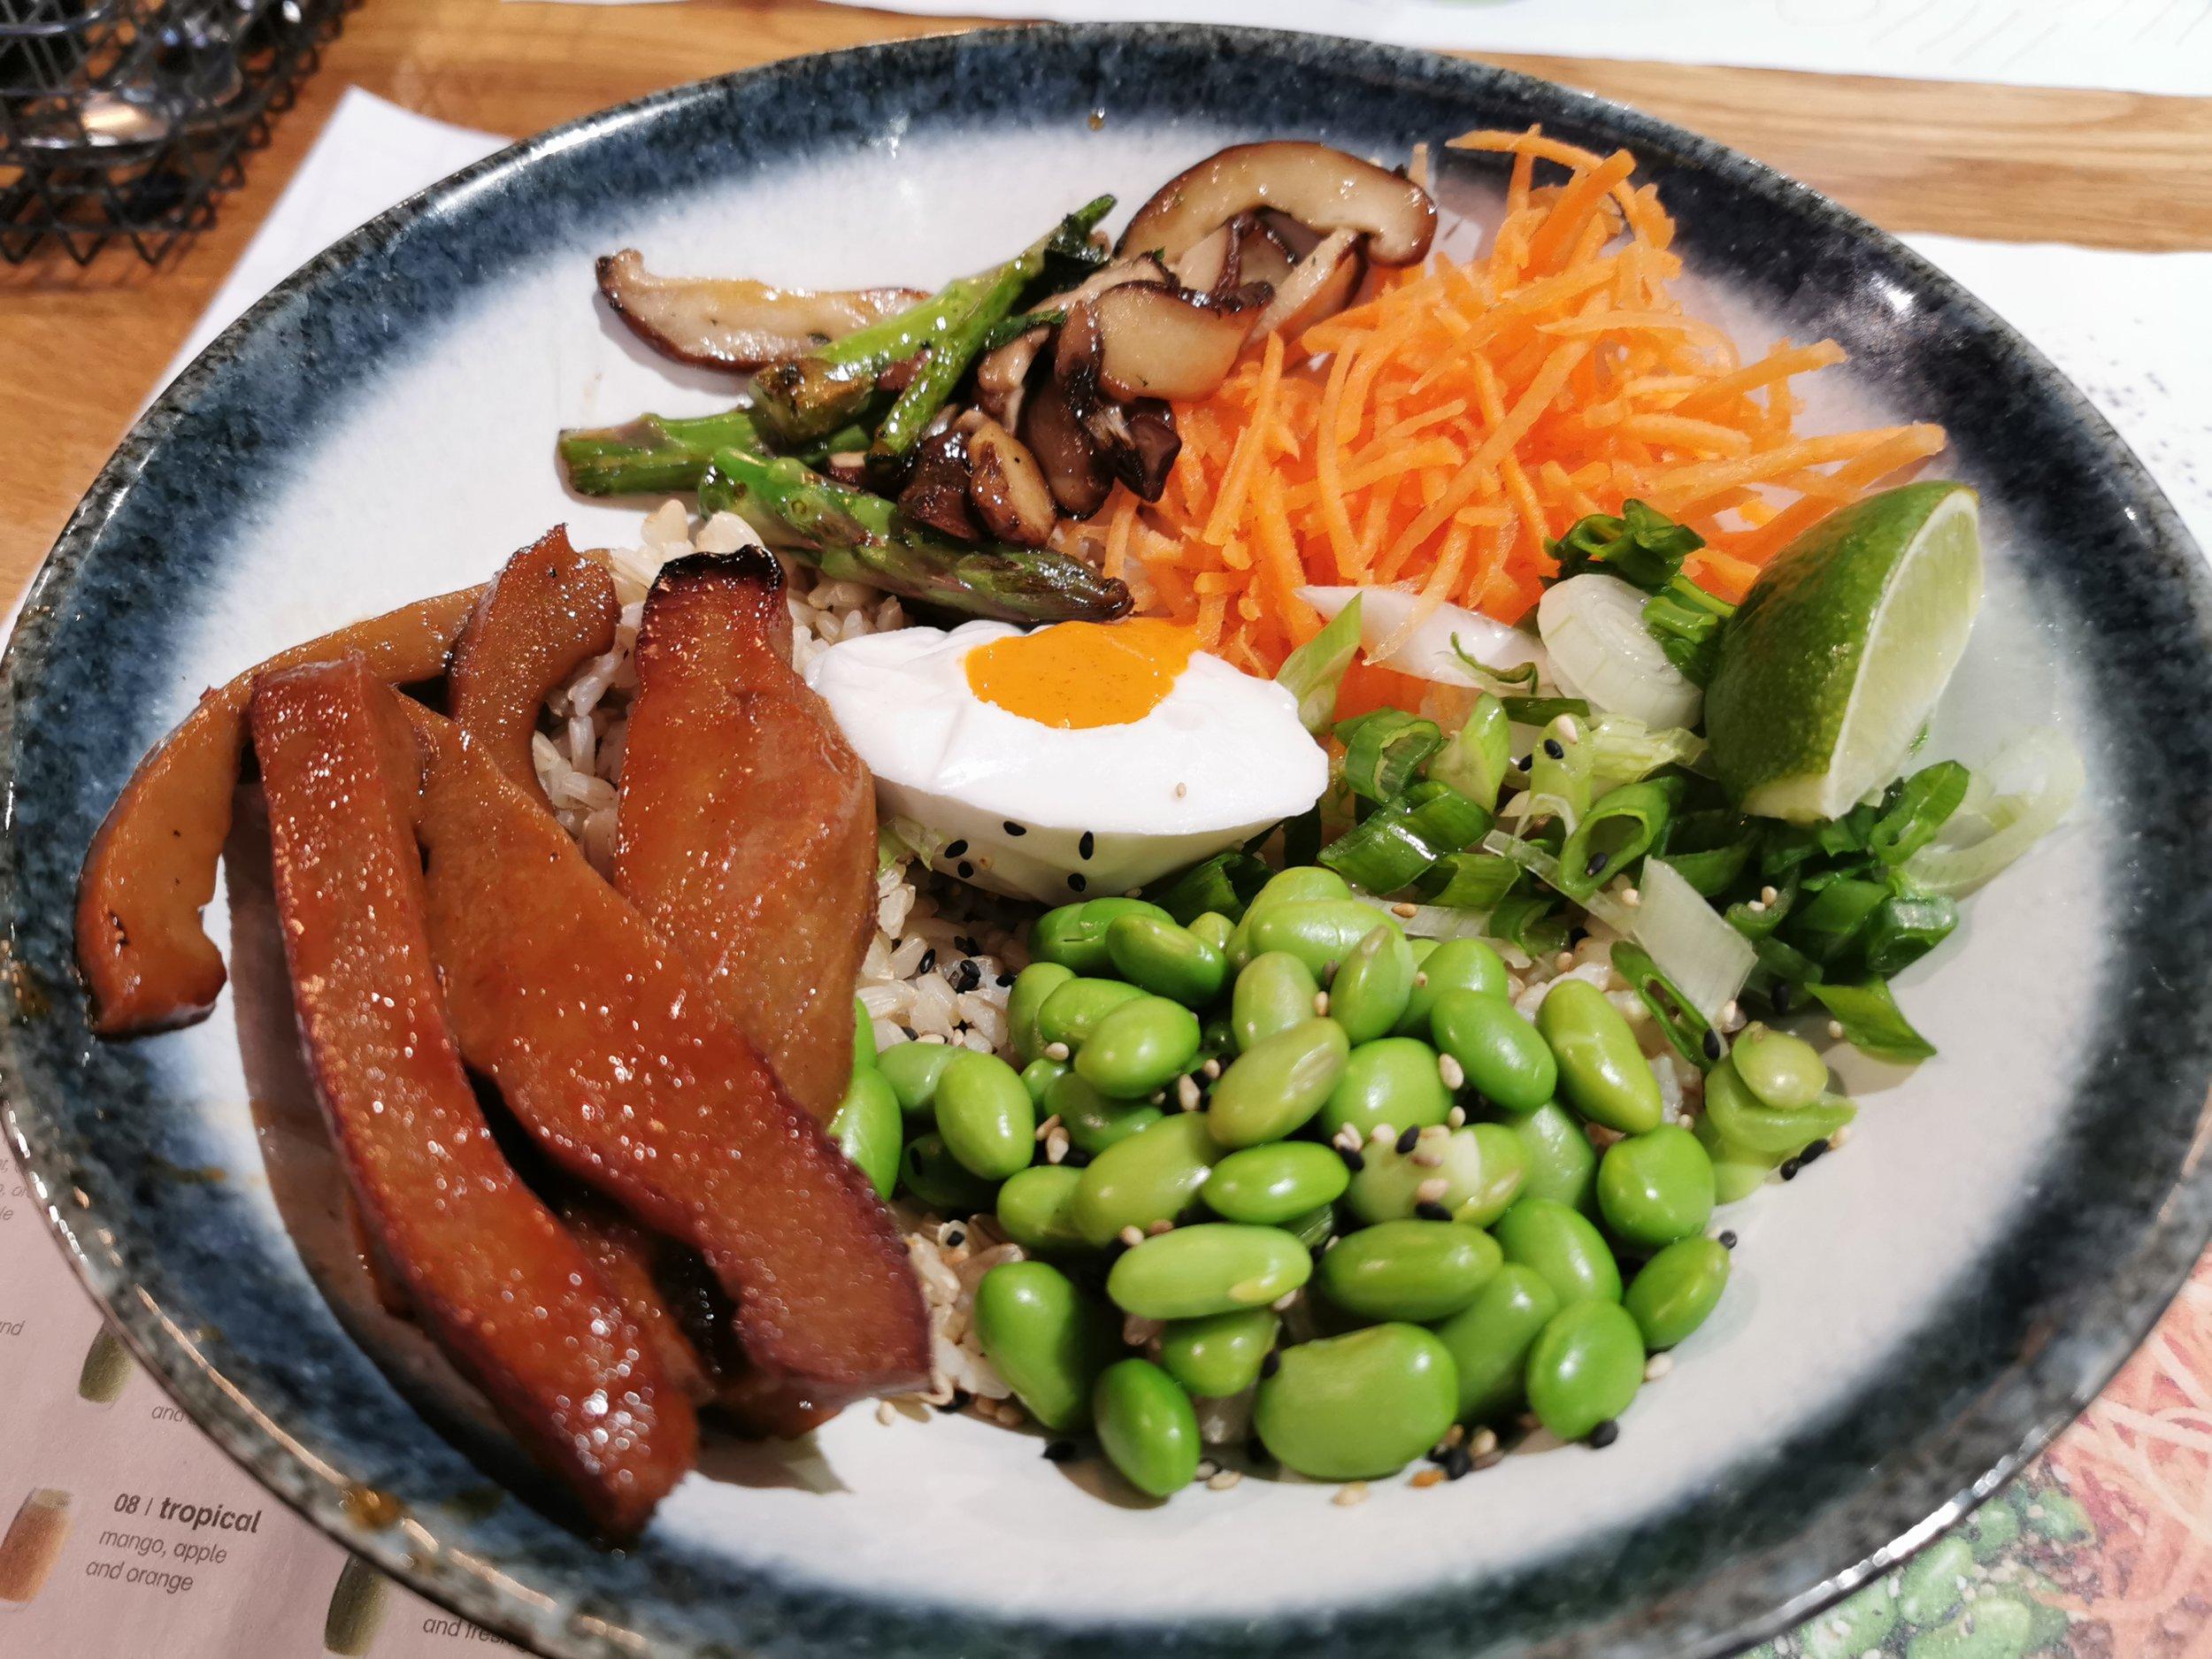 Vegan options at Wagamama